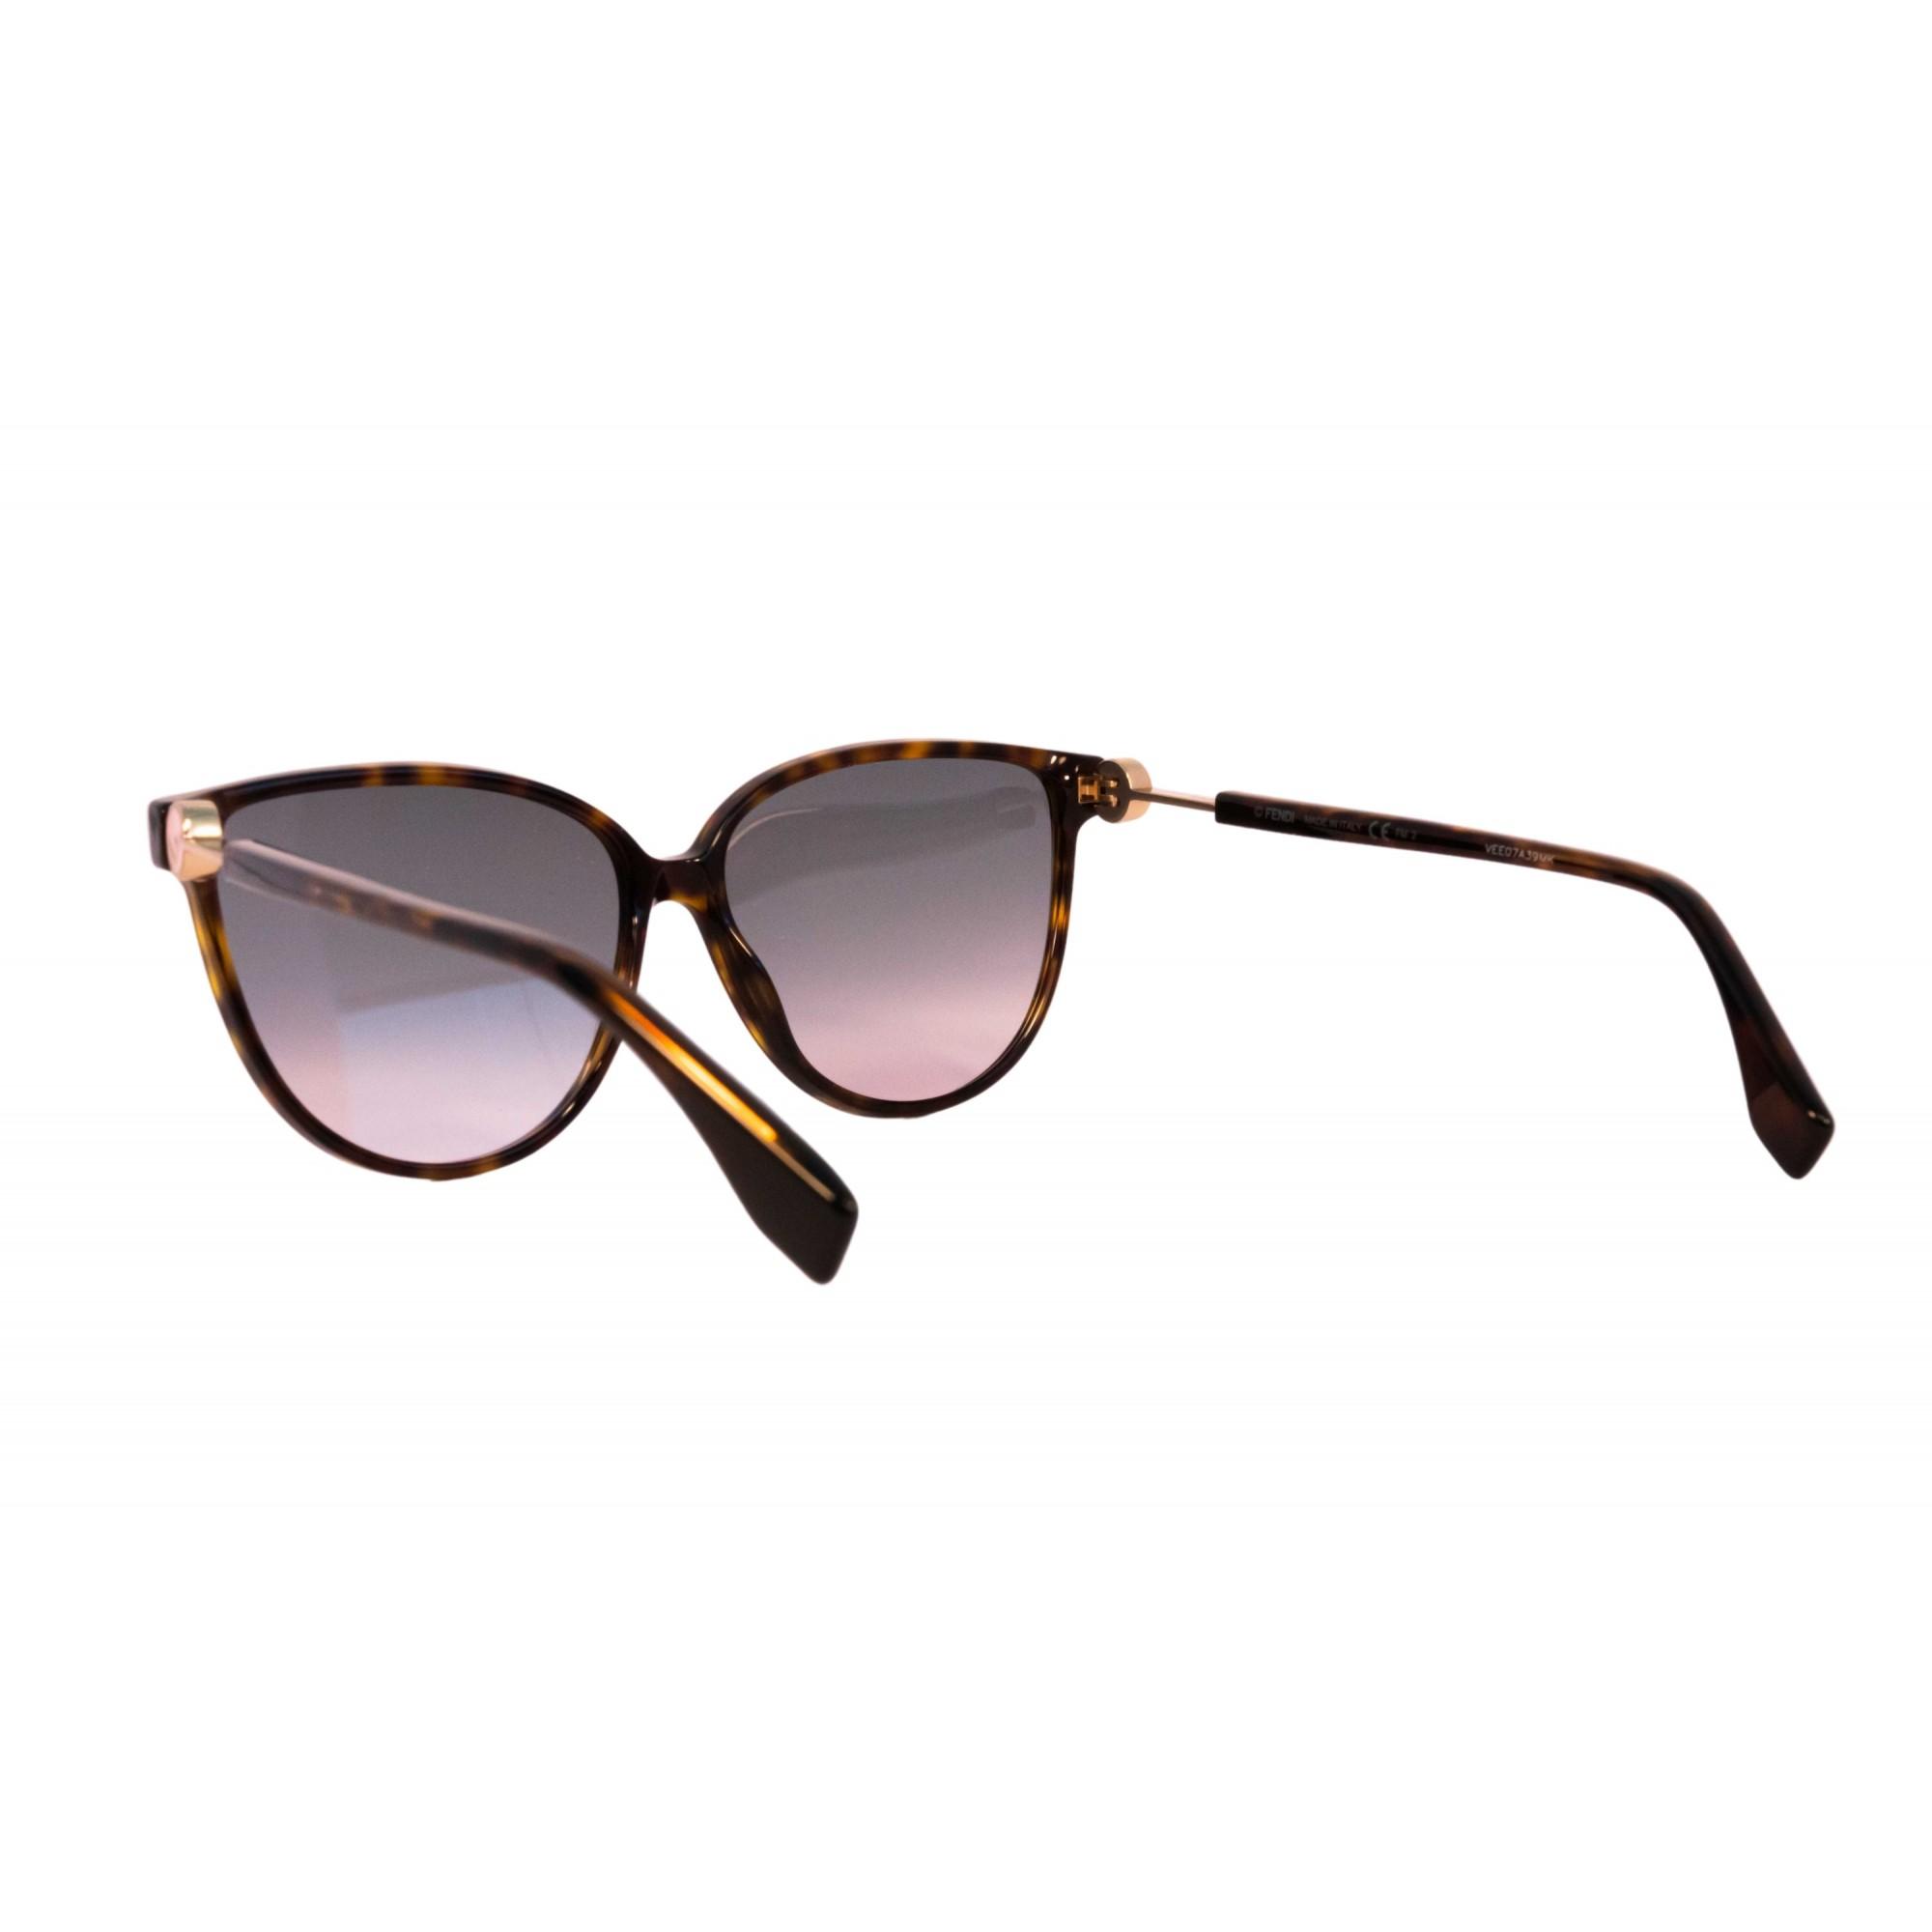 Óculos Fendi Clássico Ff0345S 086jp 59 Tartaruga Dourado